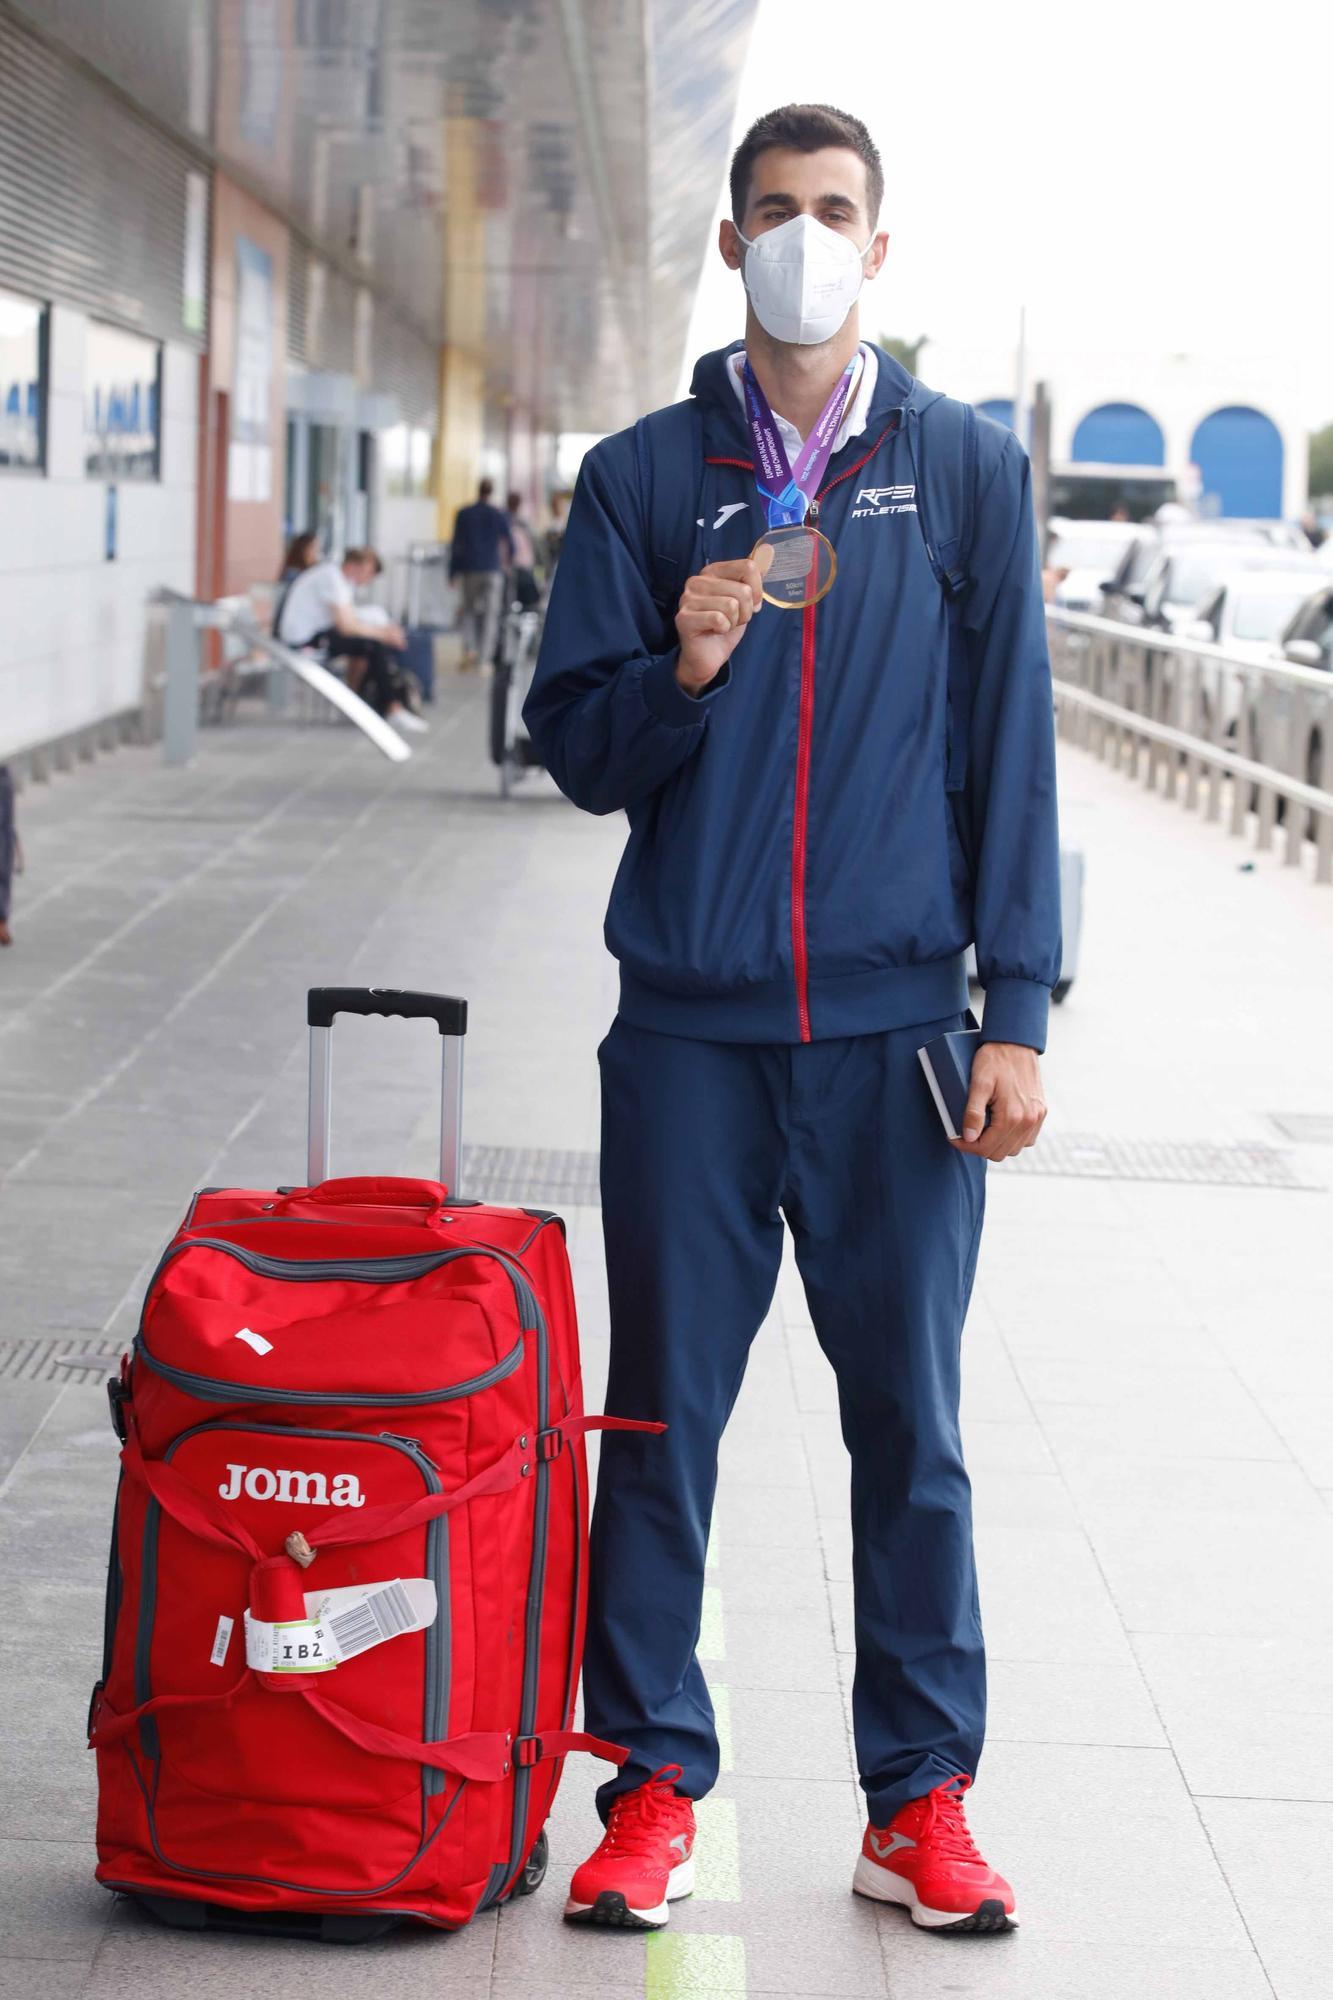 Marc Tur llega a Ibiza tras proclamarse campeón de Europa de marcha